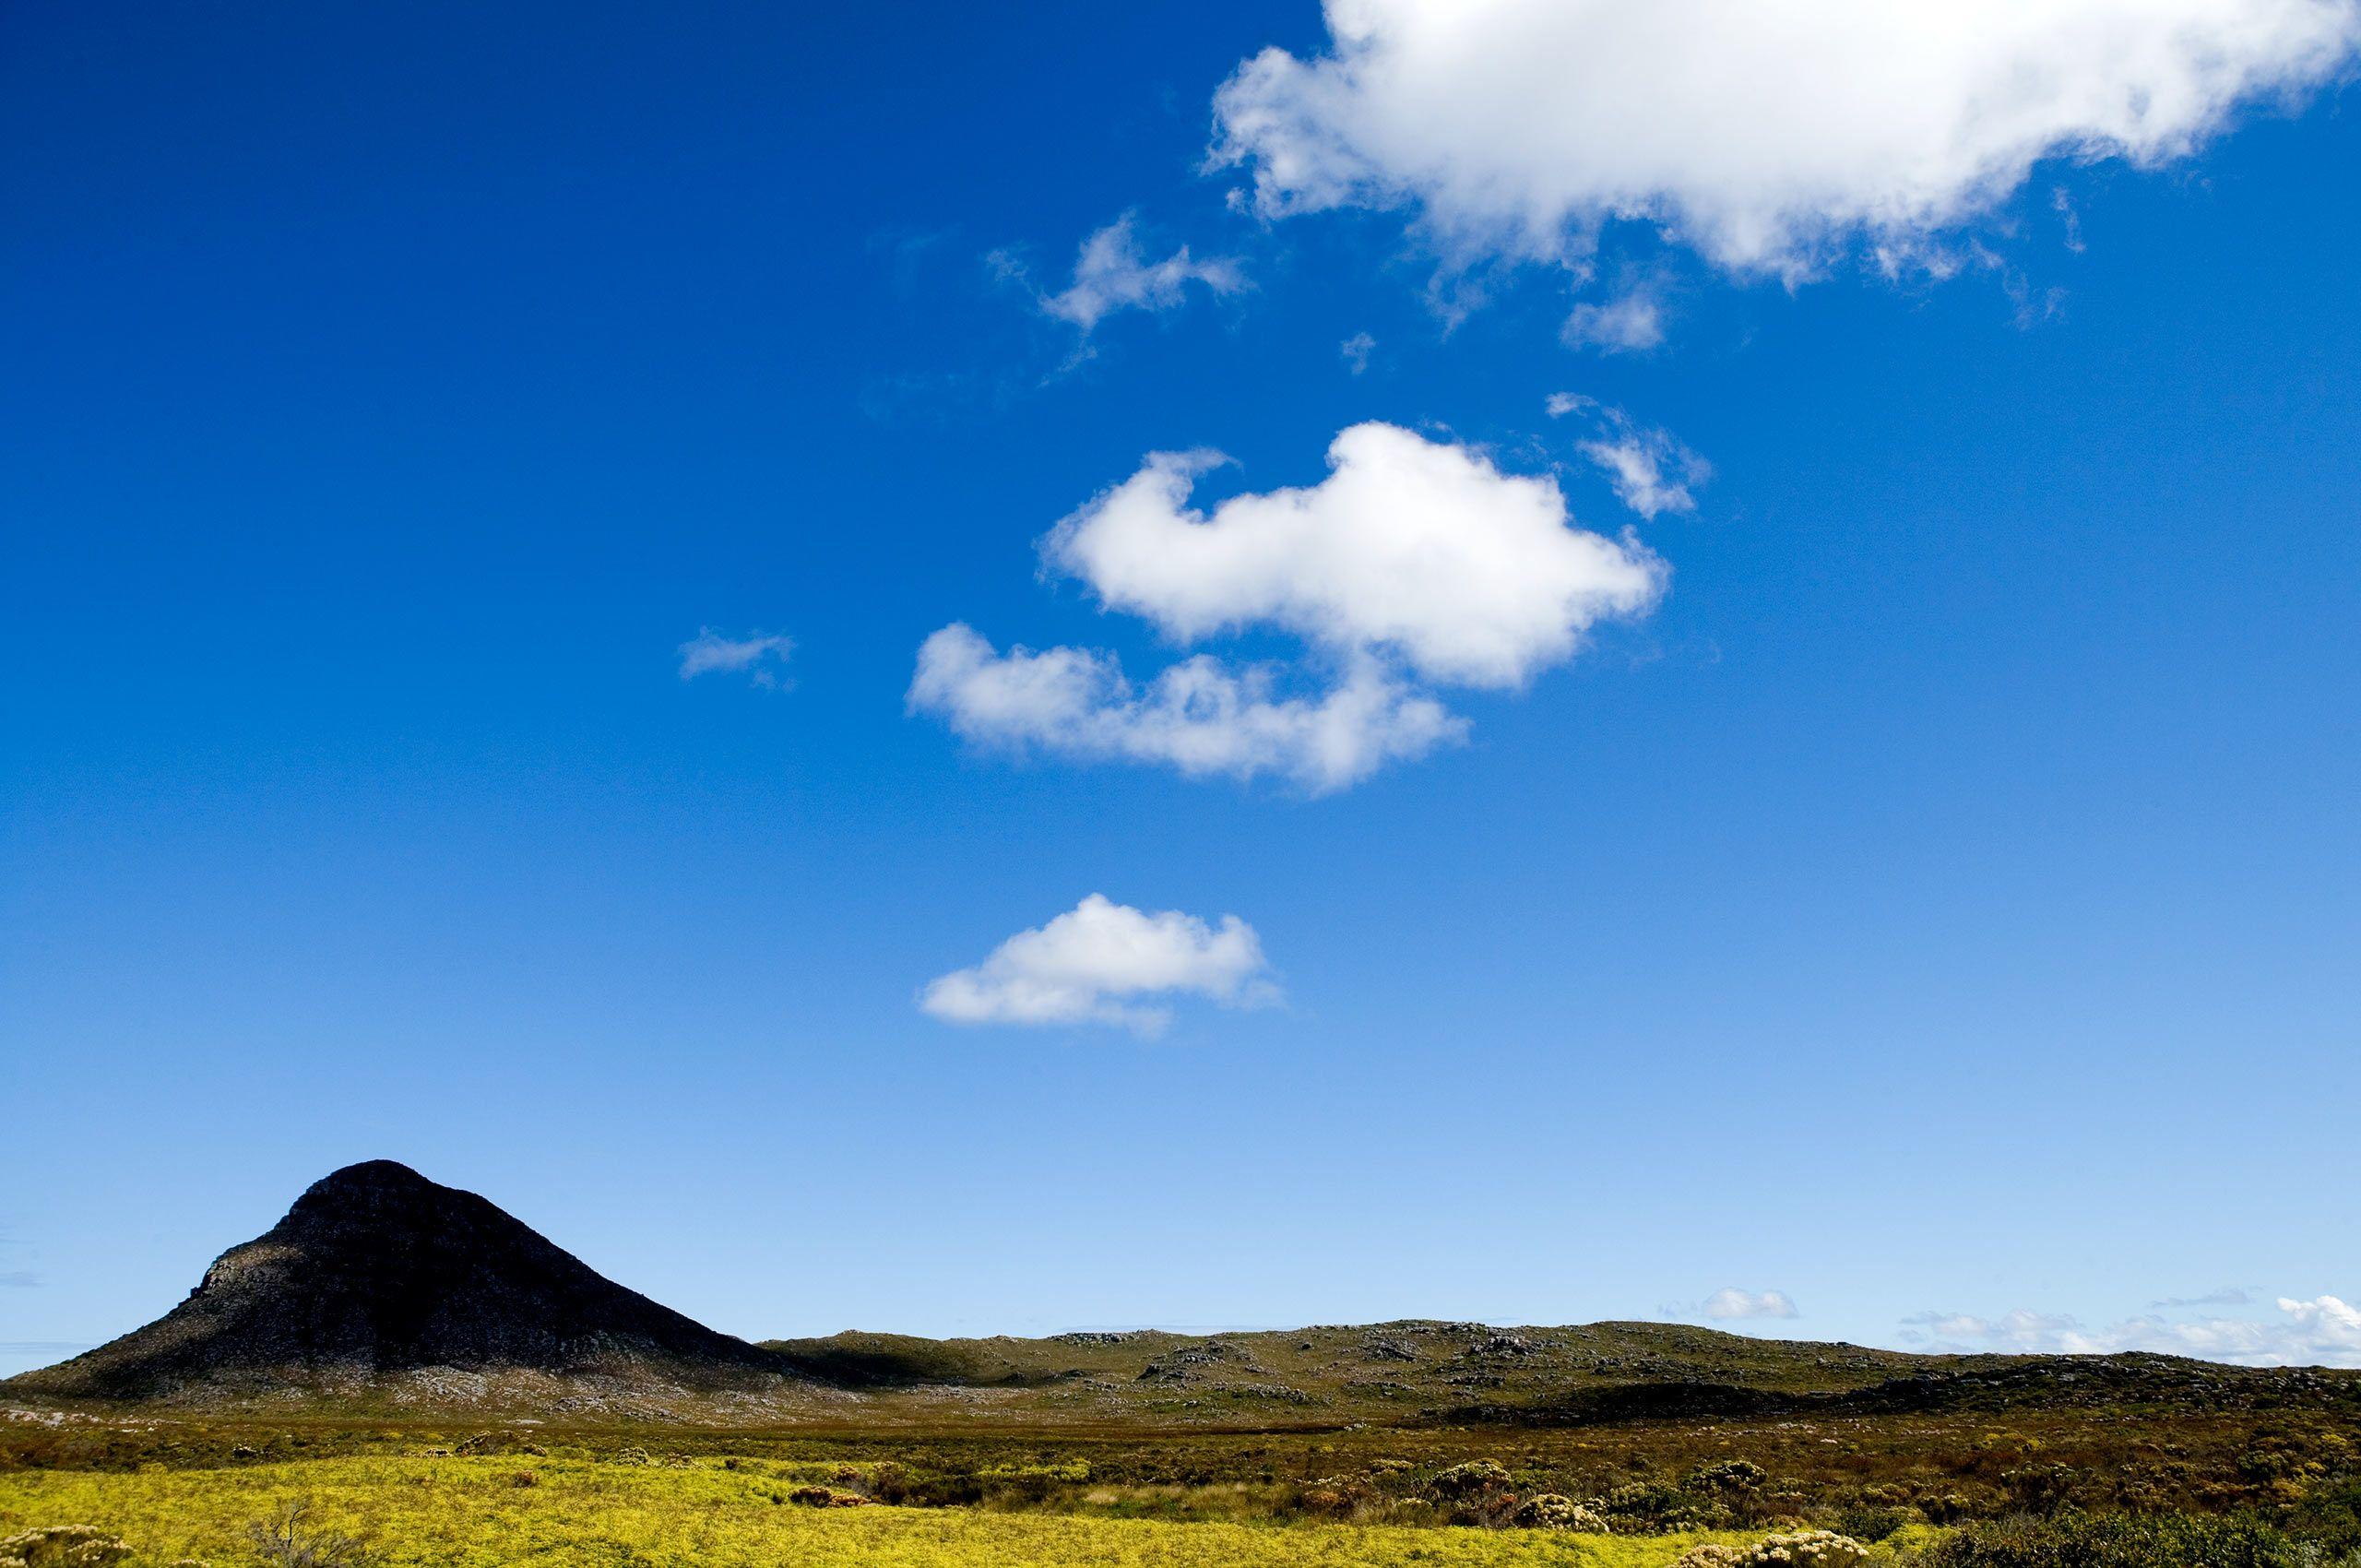 cloudscape-capeofgoodhope-southafrica-by-henrikolundphotography.jpg